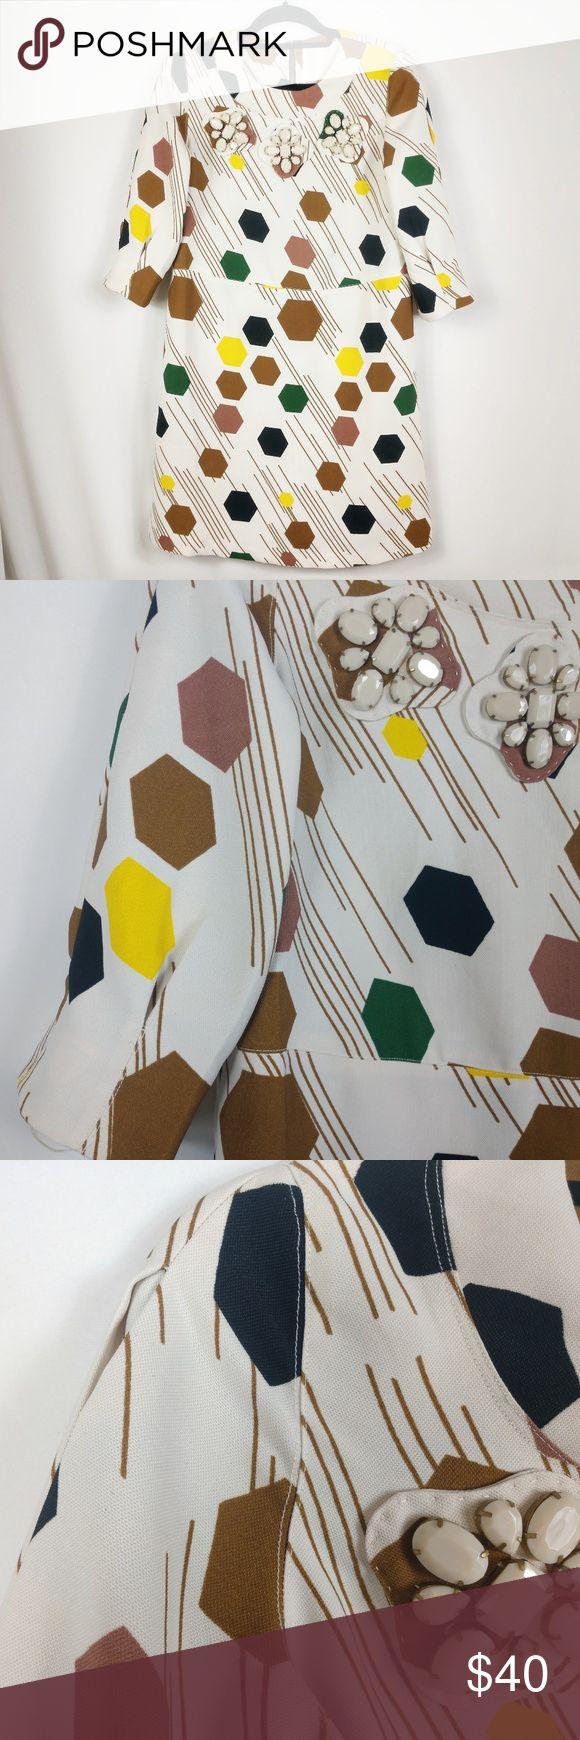 Karta Vintage Style Shift Dress Geometric Print ▪️Zip back closure ▪️Exc... 1